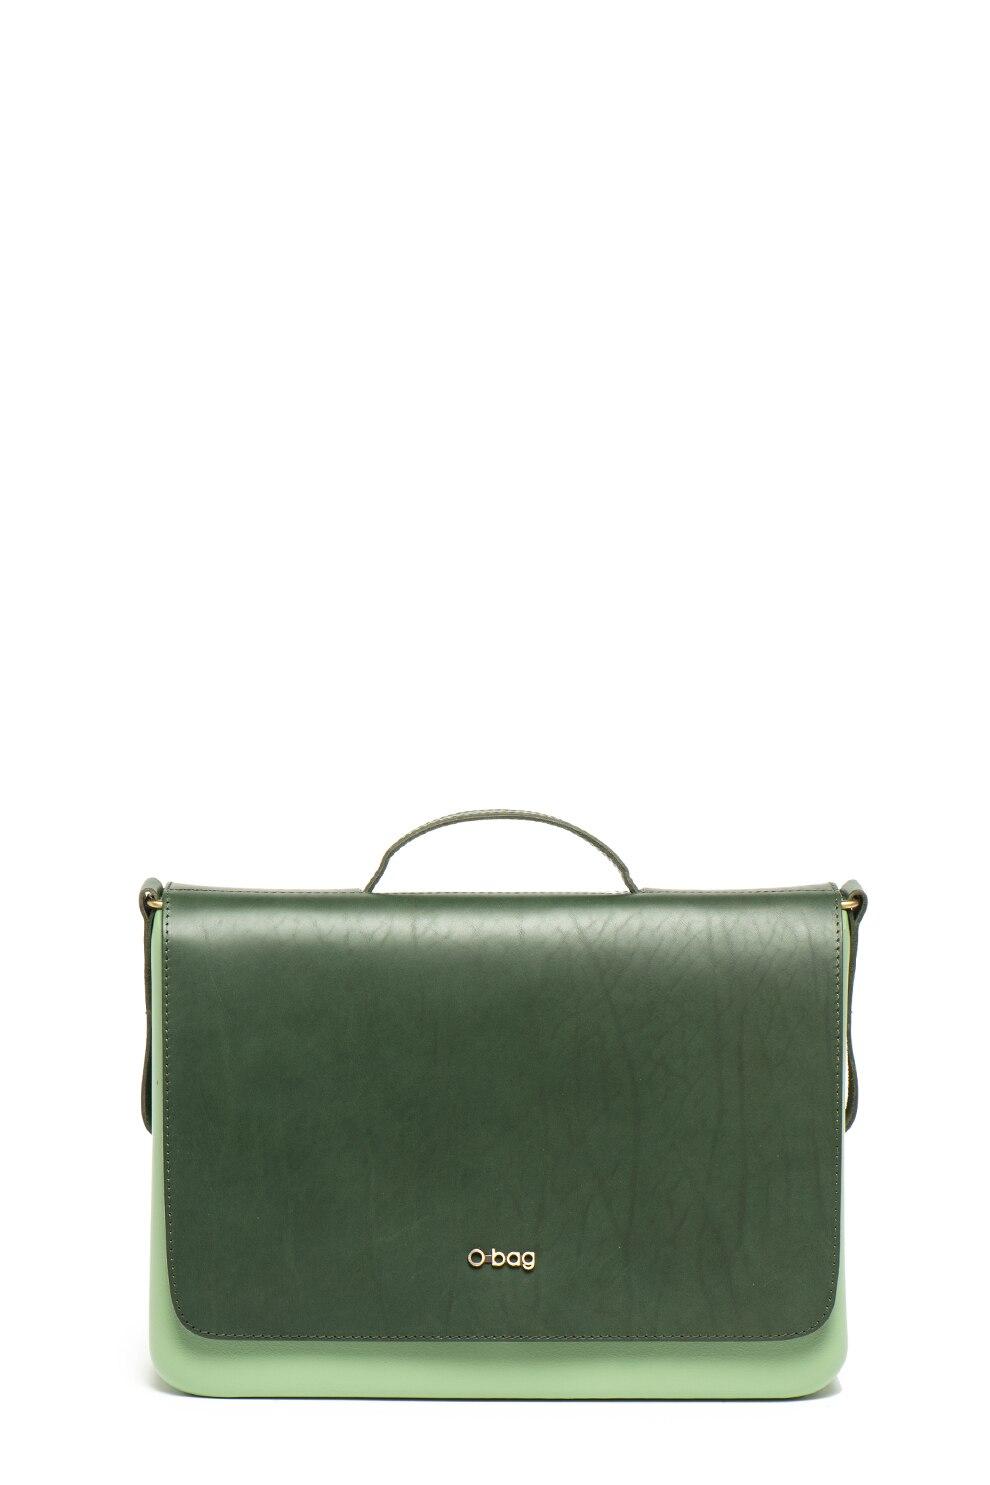 Fotografie O bag, Geanta cu bareta de umar detasabila si buzunar pentru laptop, Verde pal/Verde inchis